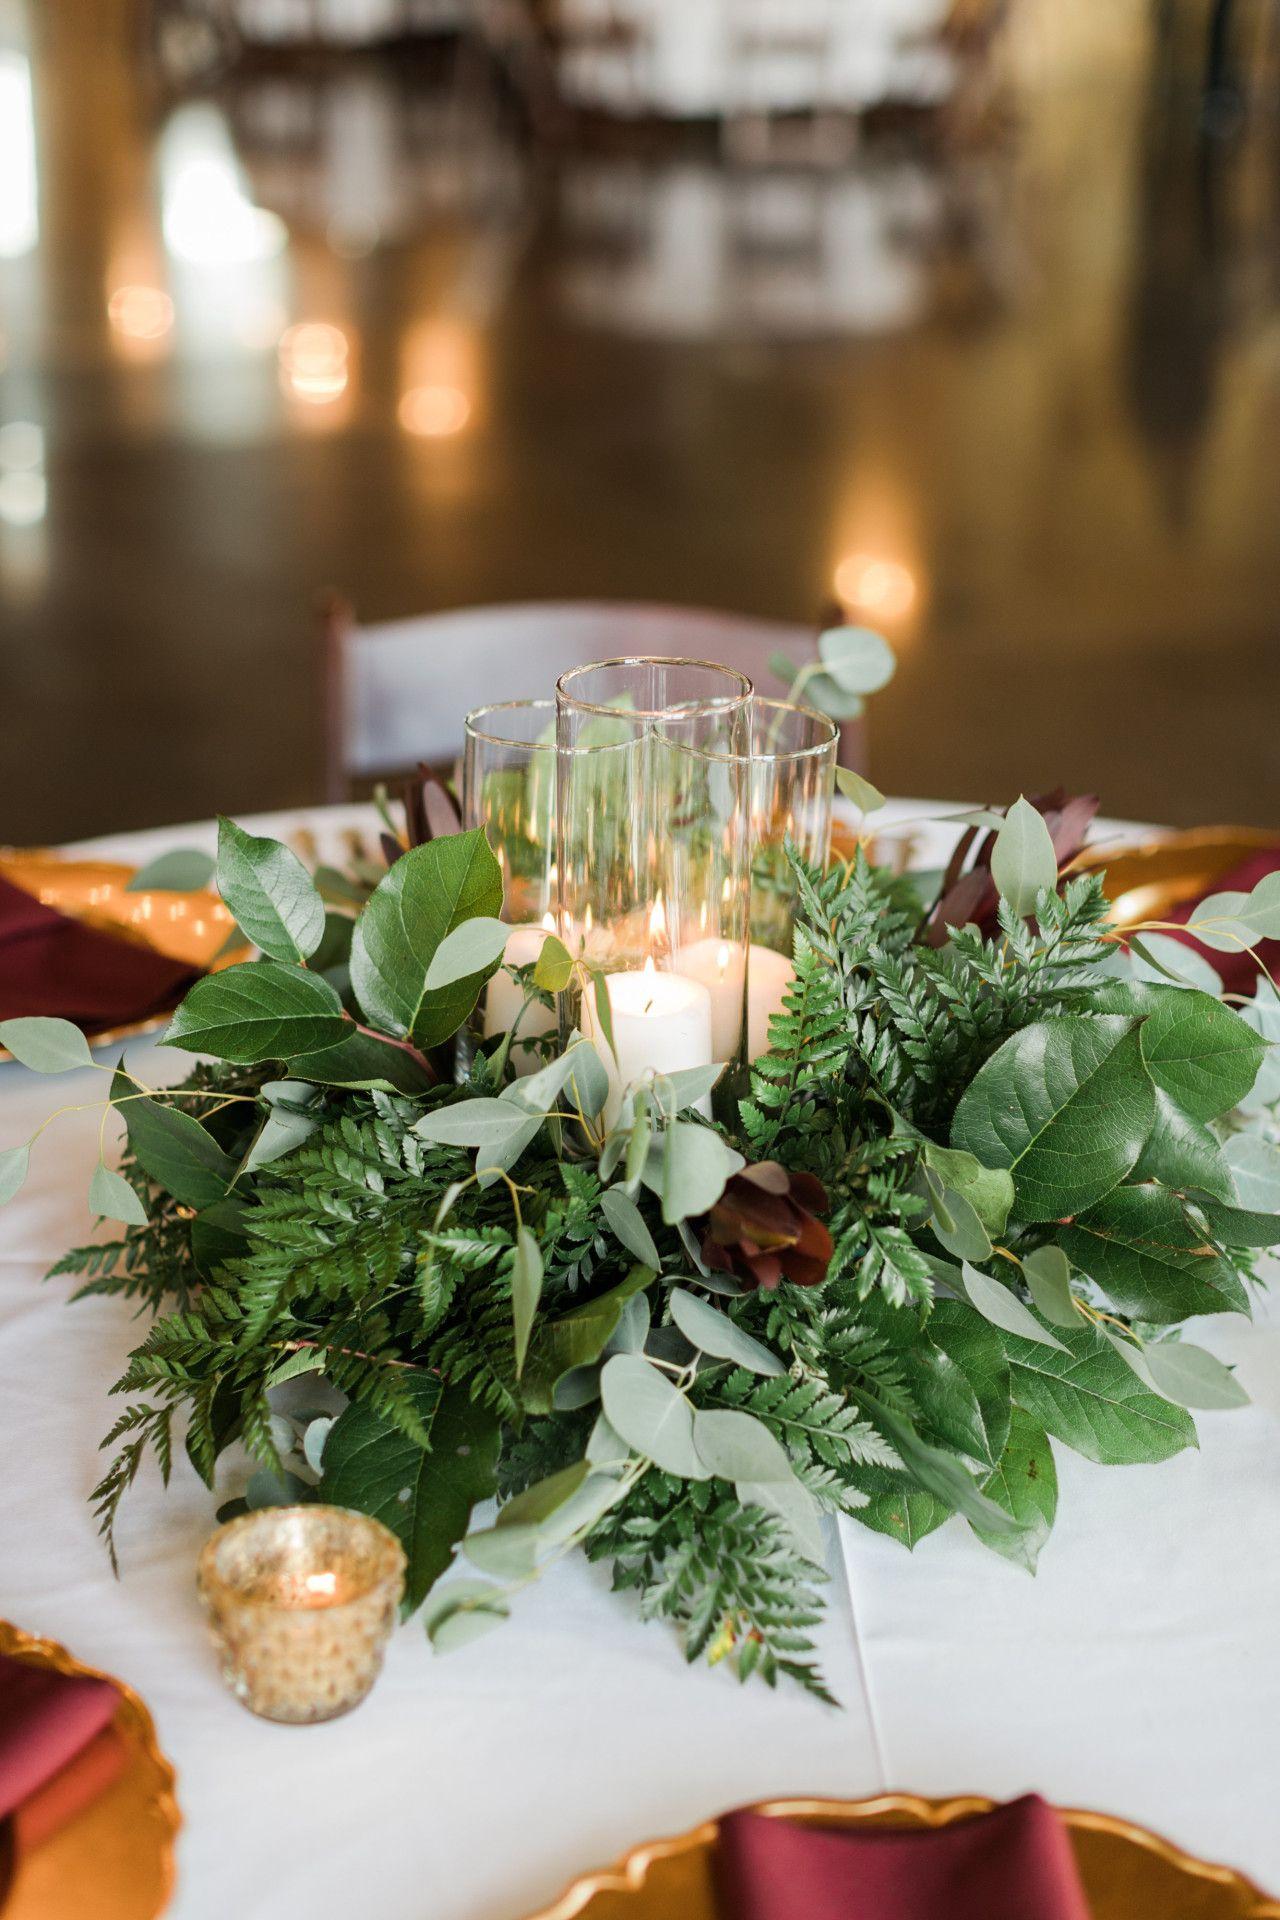 Wedding decor maroon  wedding centerpiece with greenery  candles  elegant wedding